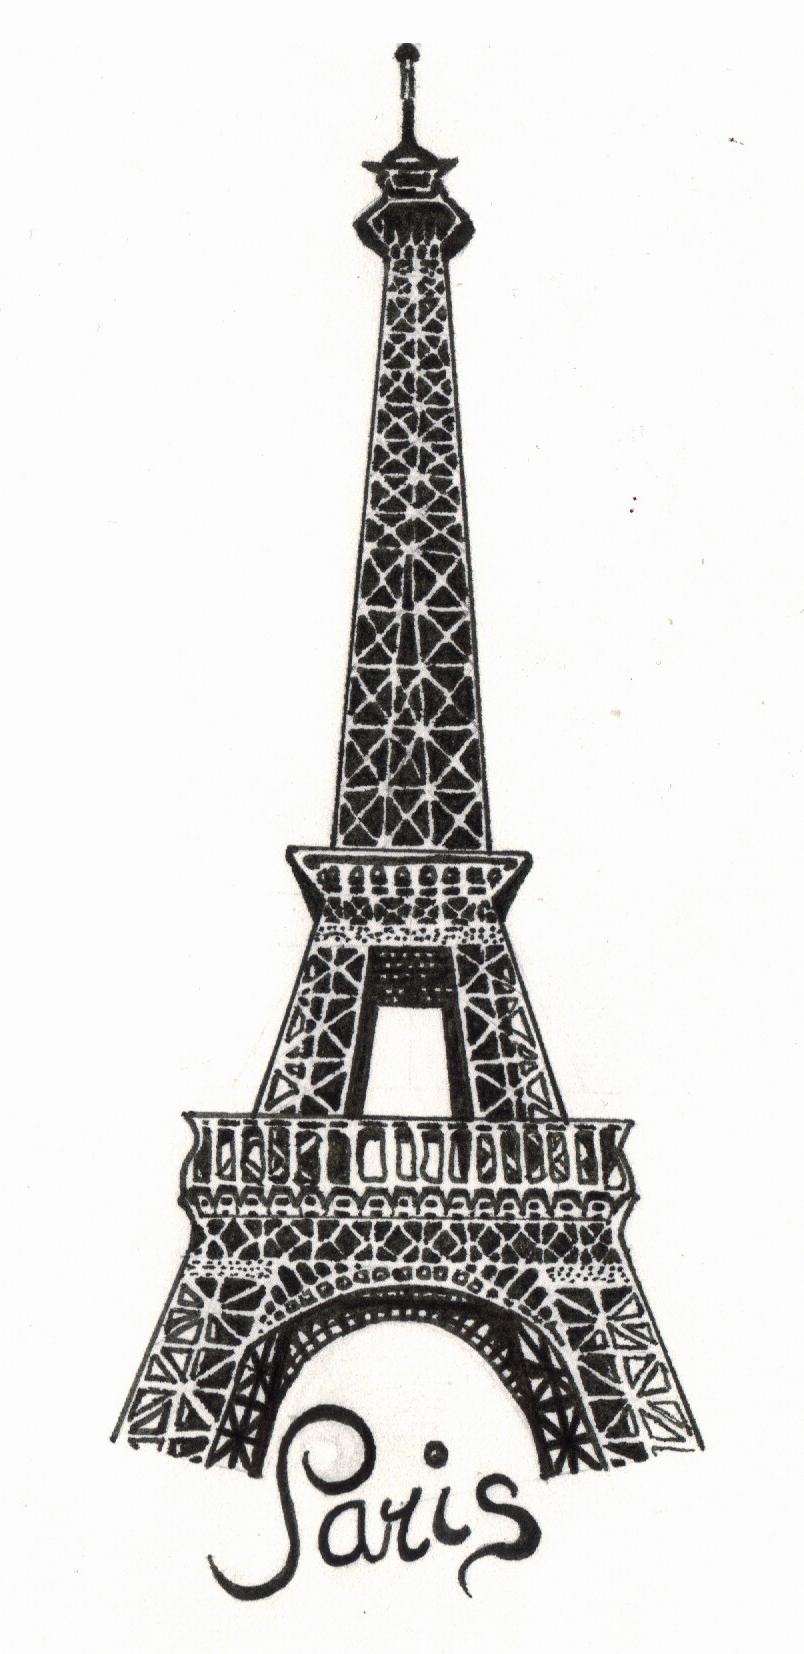 Paris - The Eiffel Tower by the-snow-white on DeviantArt